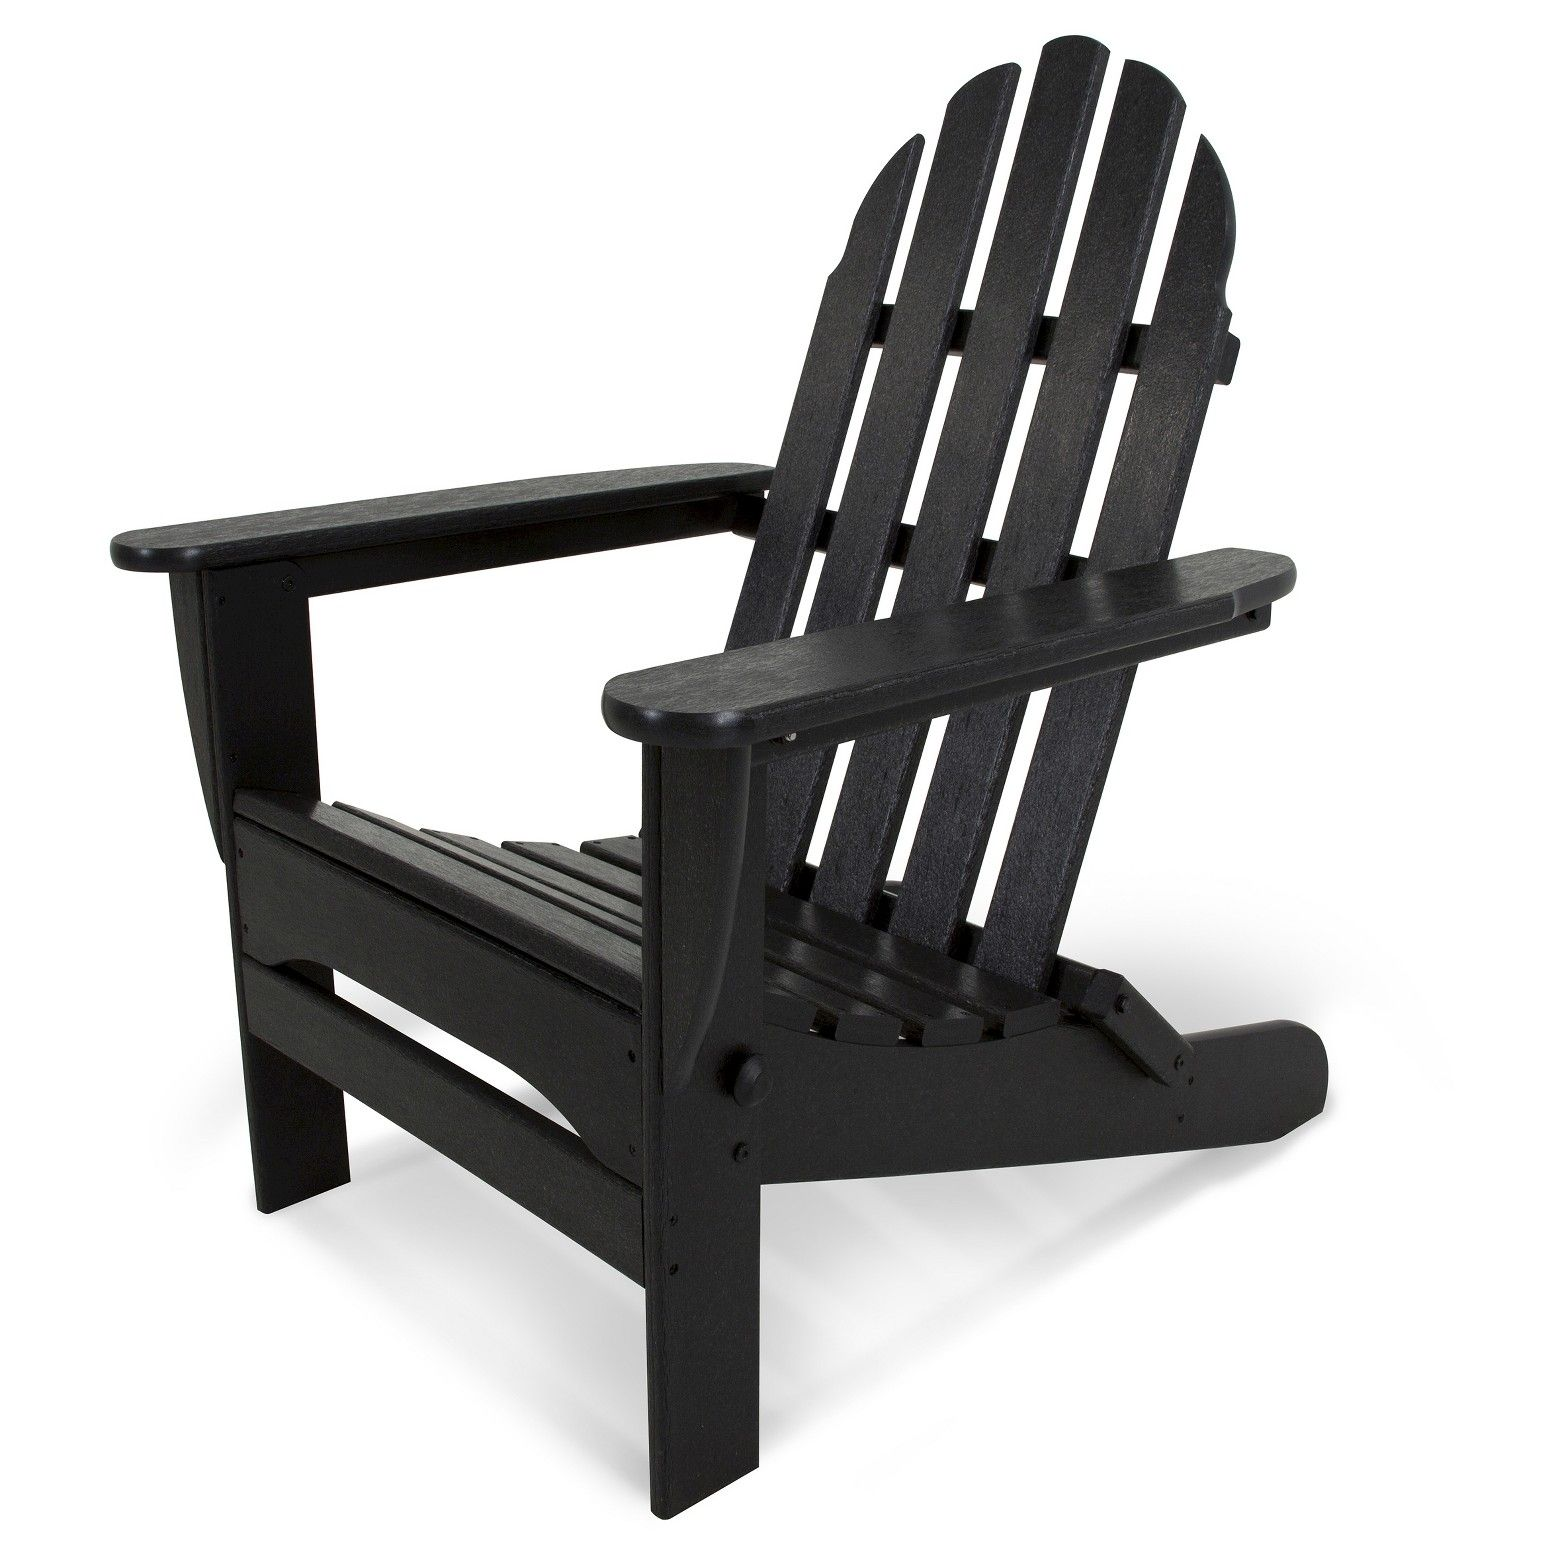 POLYWOOD Classic Folding Patio Adirondack Chair Black